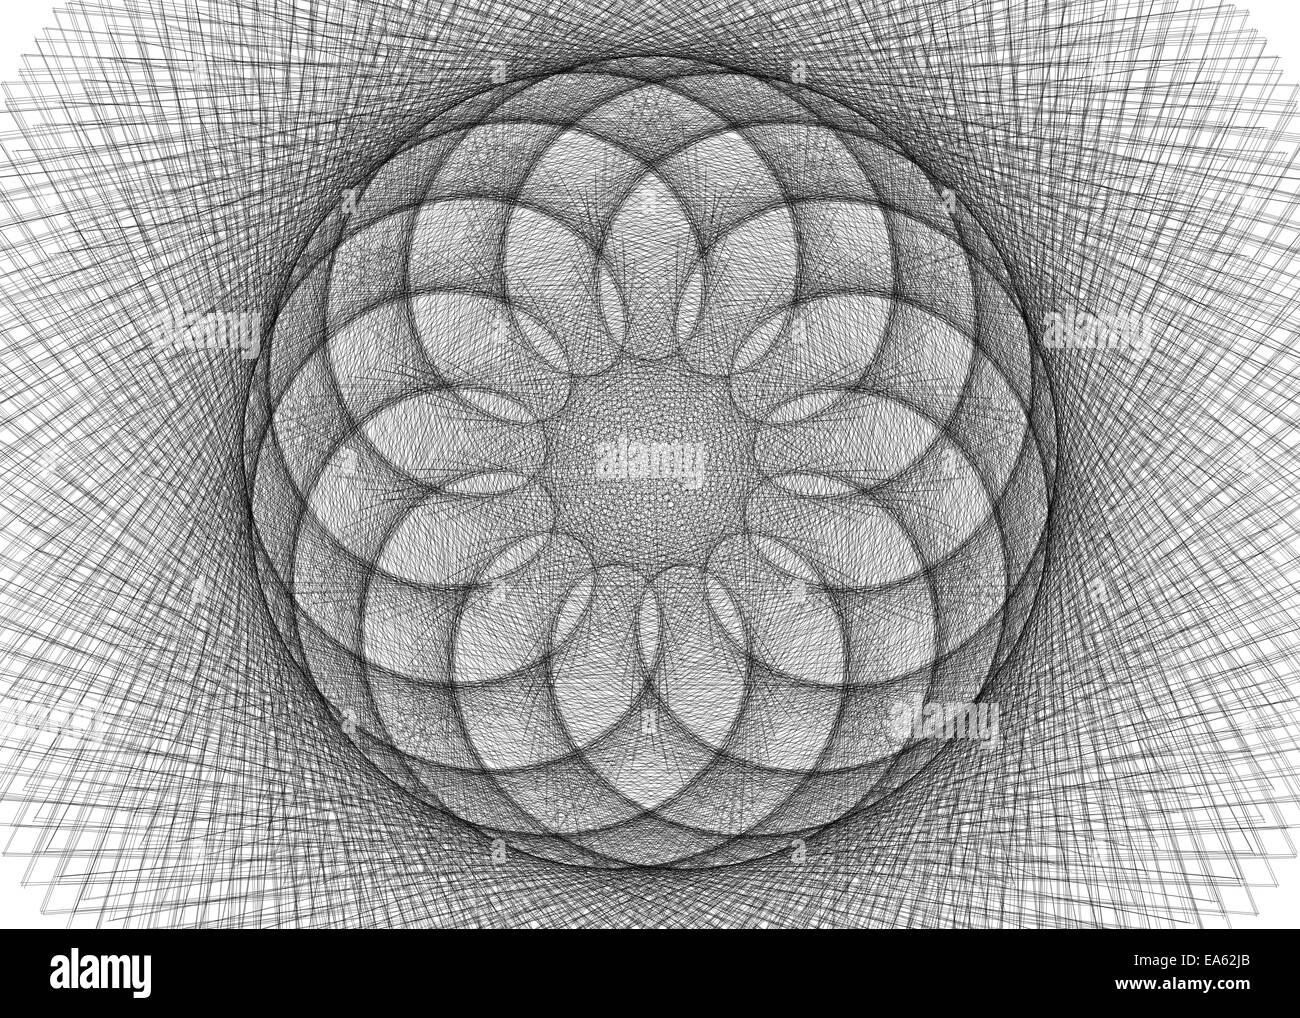 Spirographs - Stock Image